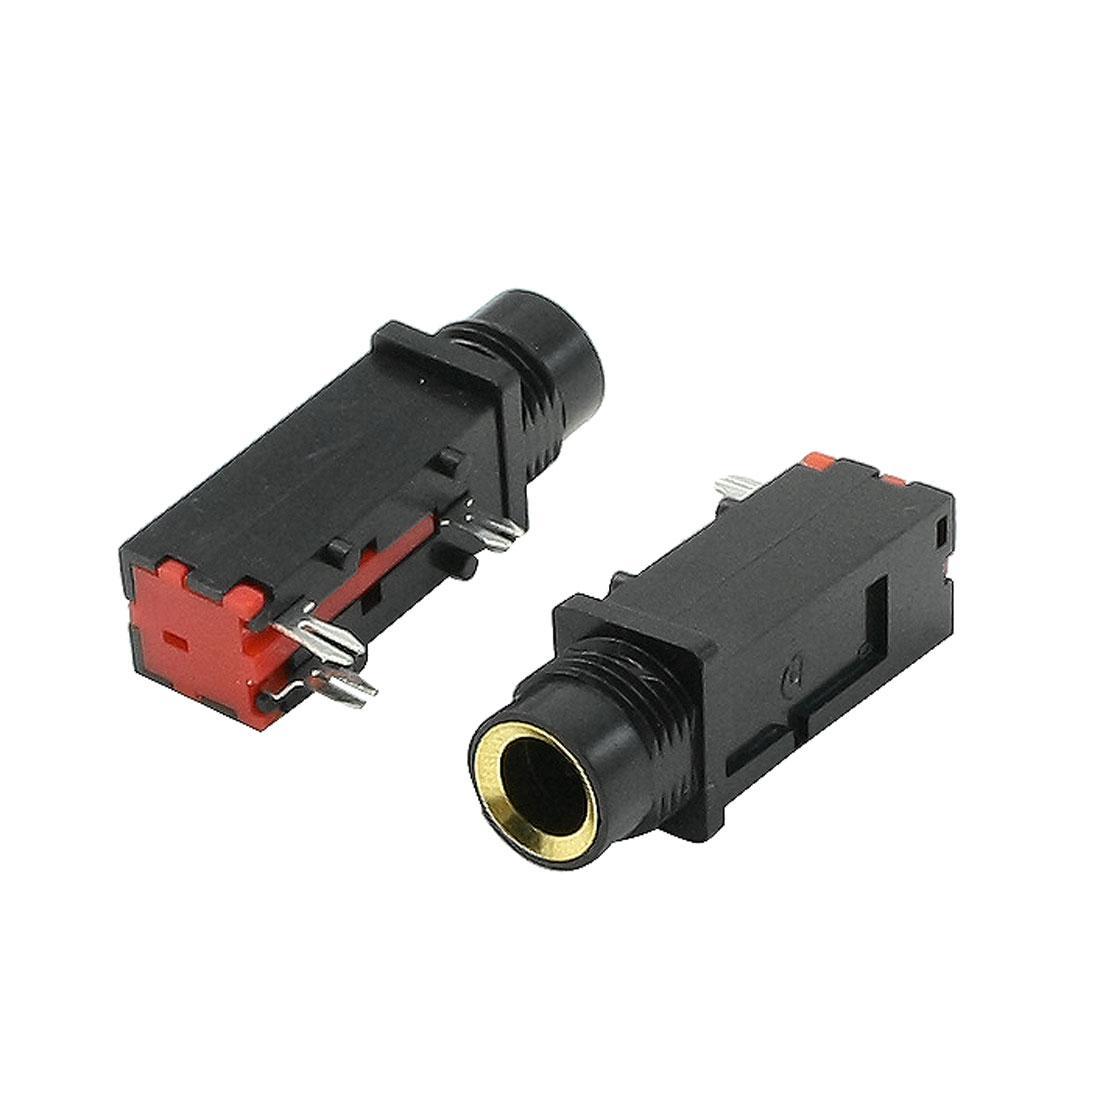 Audio Usb Kabel Stereo Pcb Jack Panel Mount Kopfhörer Anschluss 6.5 ...